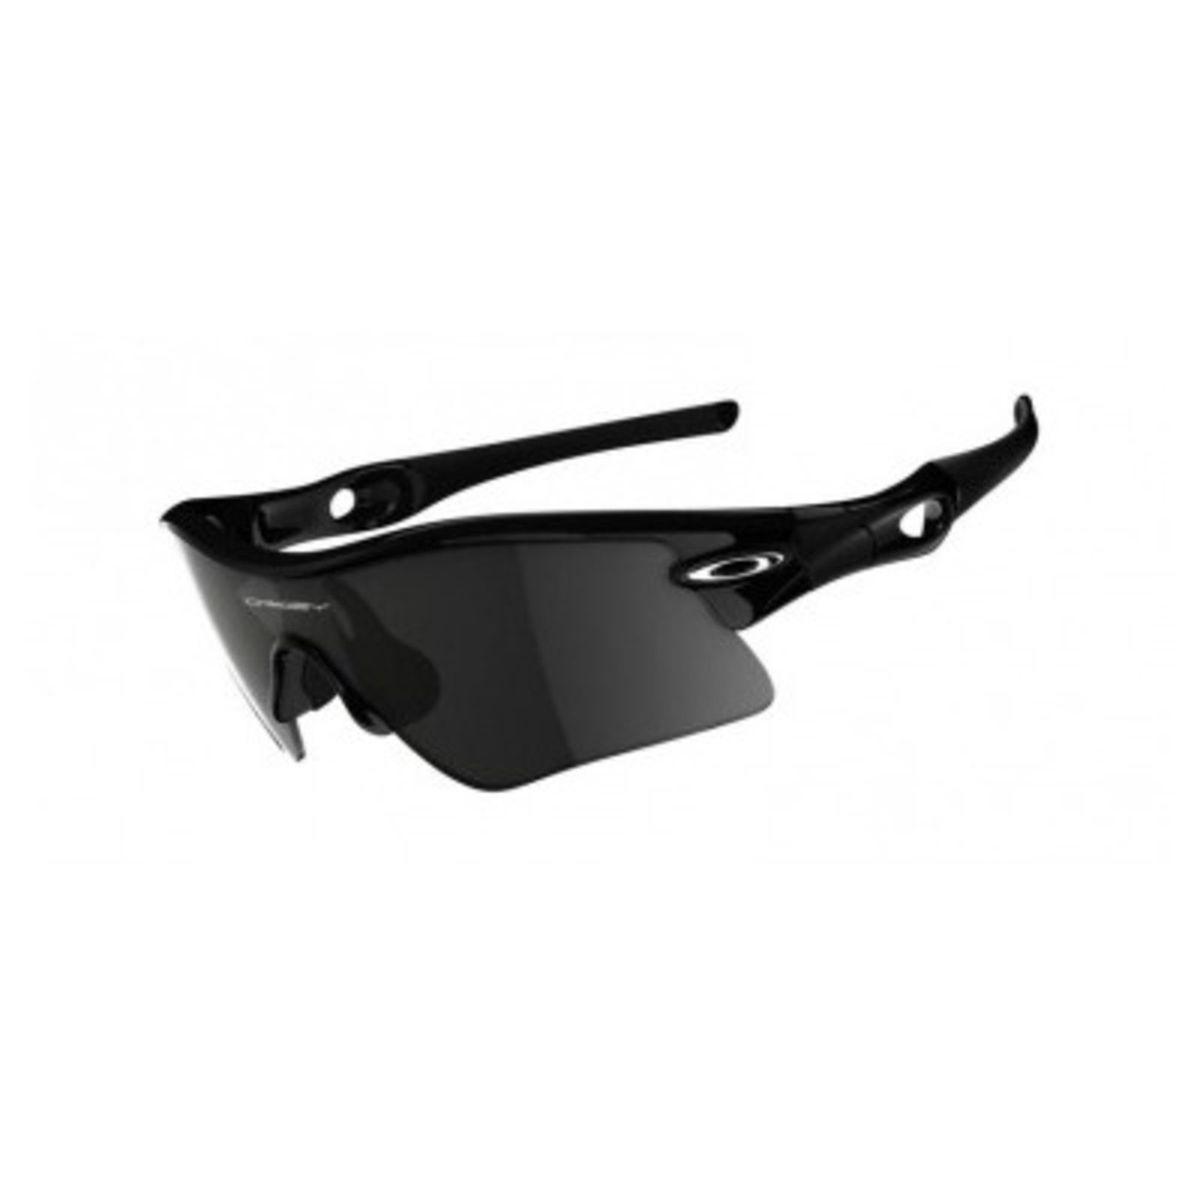 oakley radar path 5 lentes - óculos oakley.  Czm6ly9wag90b3muzw5qb2vplmnvbs5ici9wcm9kdwn0cy8ymtq0mdqvnjnjmdu2zdu1yjy2mzzjnzg3njazzgm1nmuwotnmmmeuanbn  ... c16d7cca27